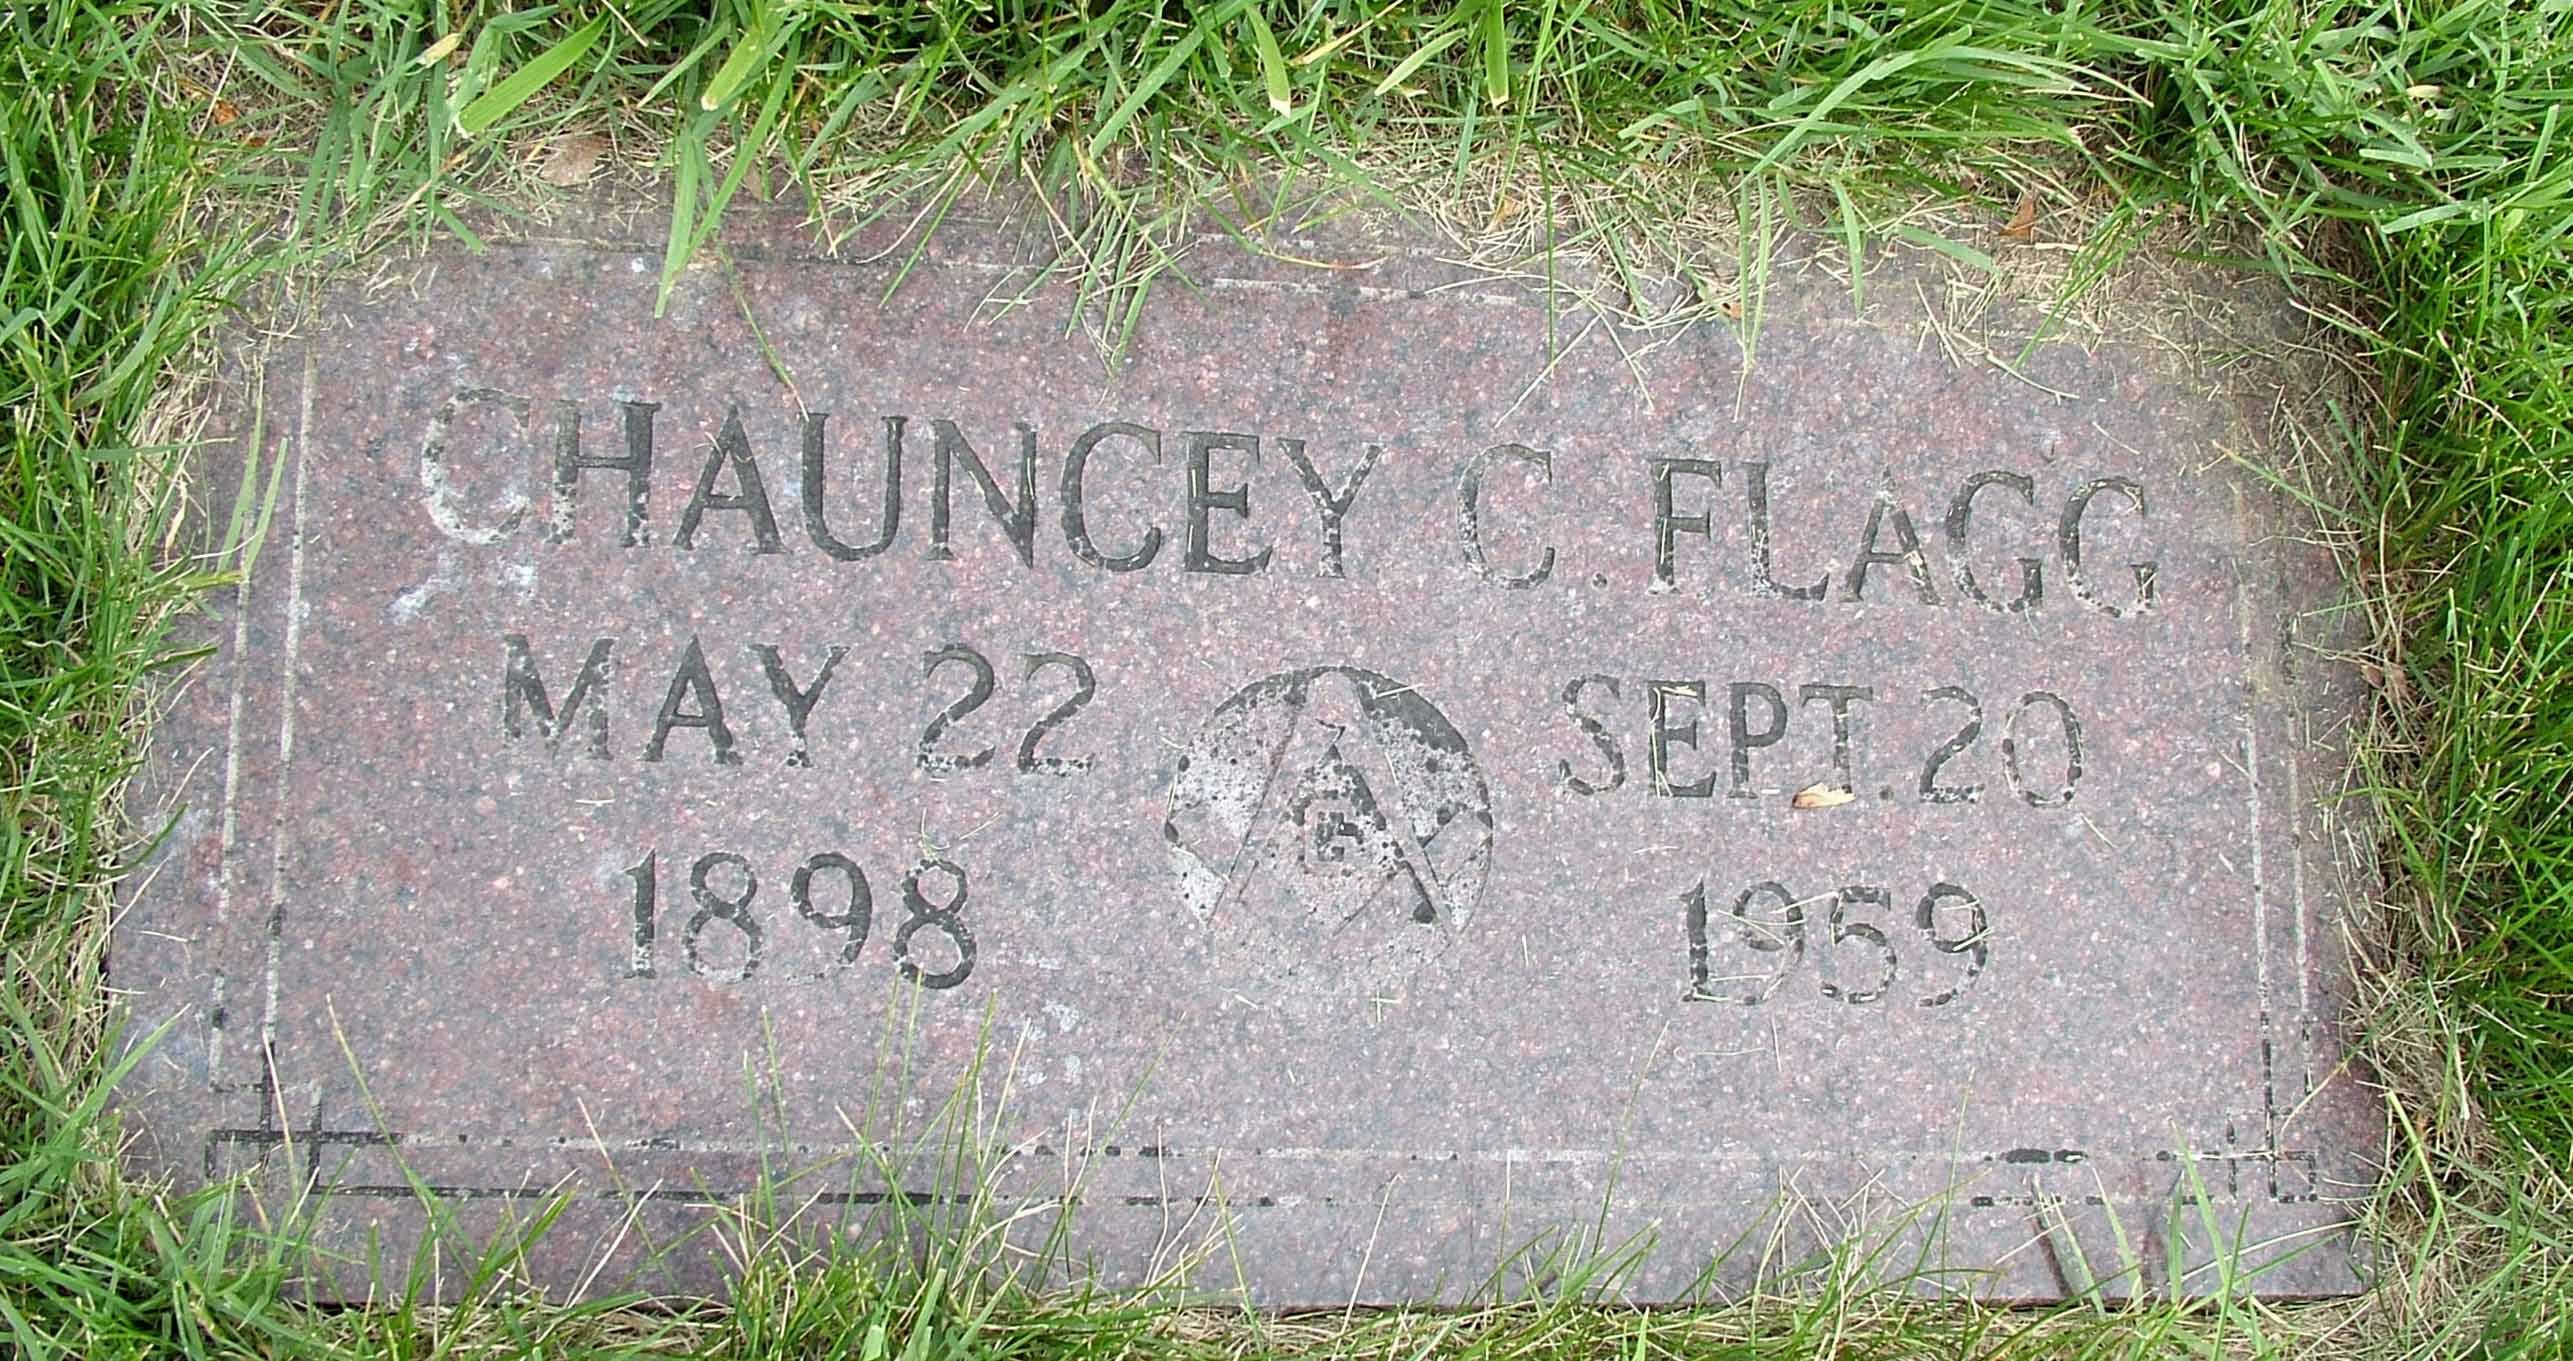 Chauncey Cole Flagg